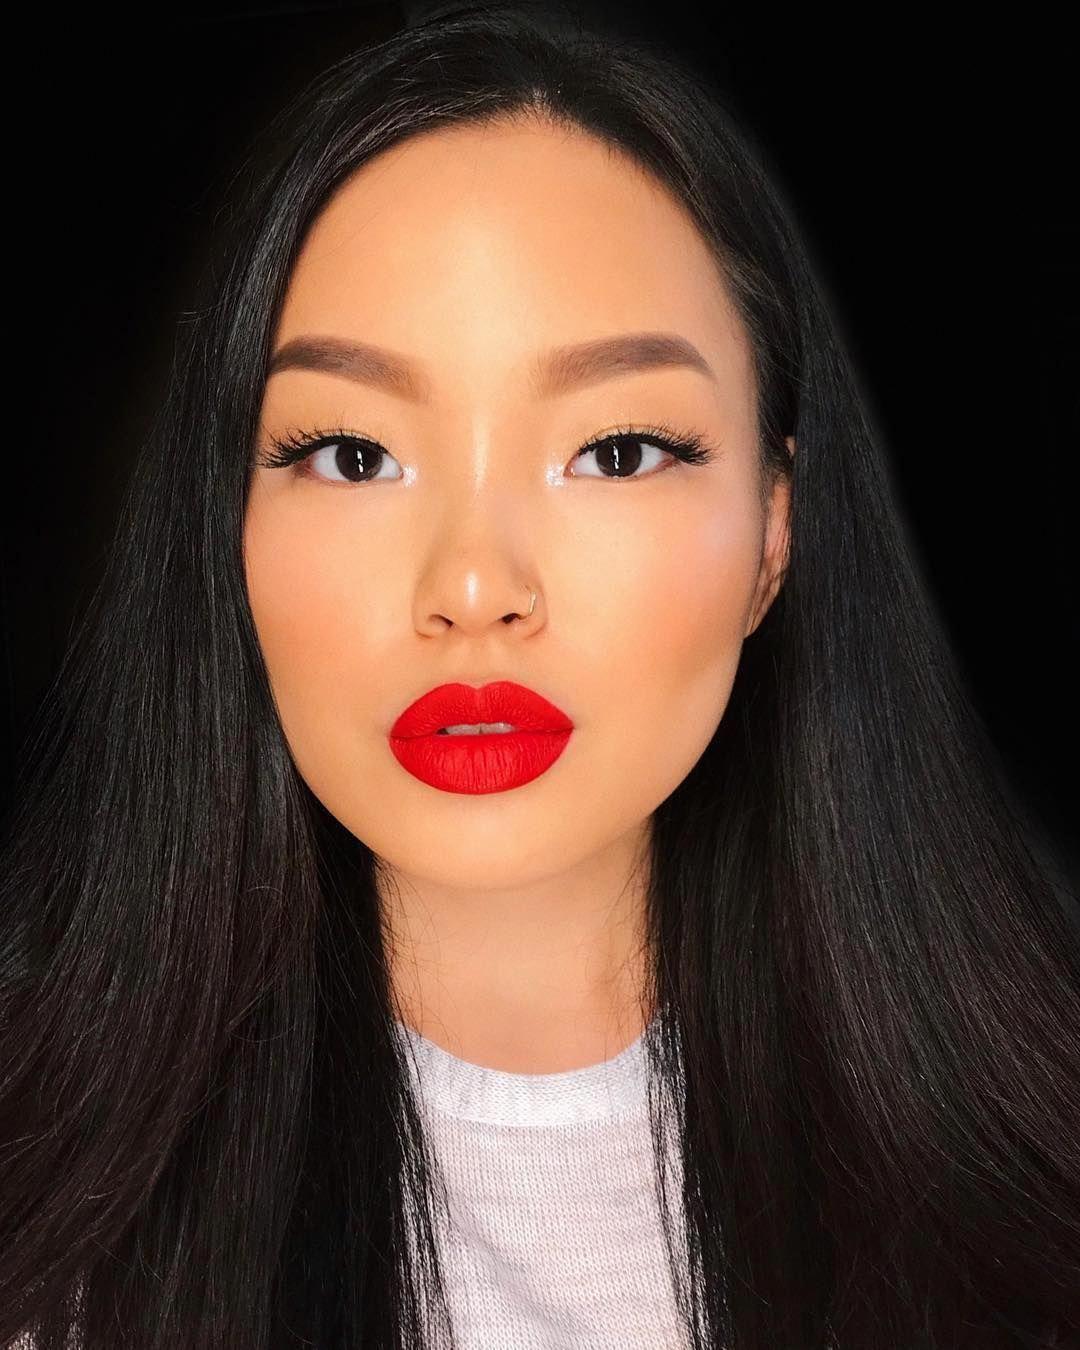 Makeuplooks Makeup looks, Red lips makeup look, Makeup